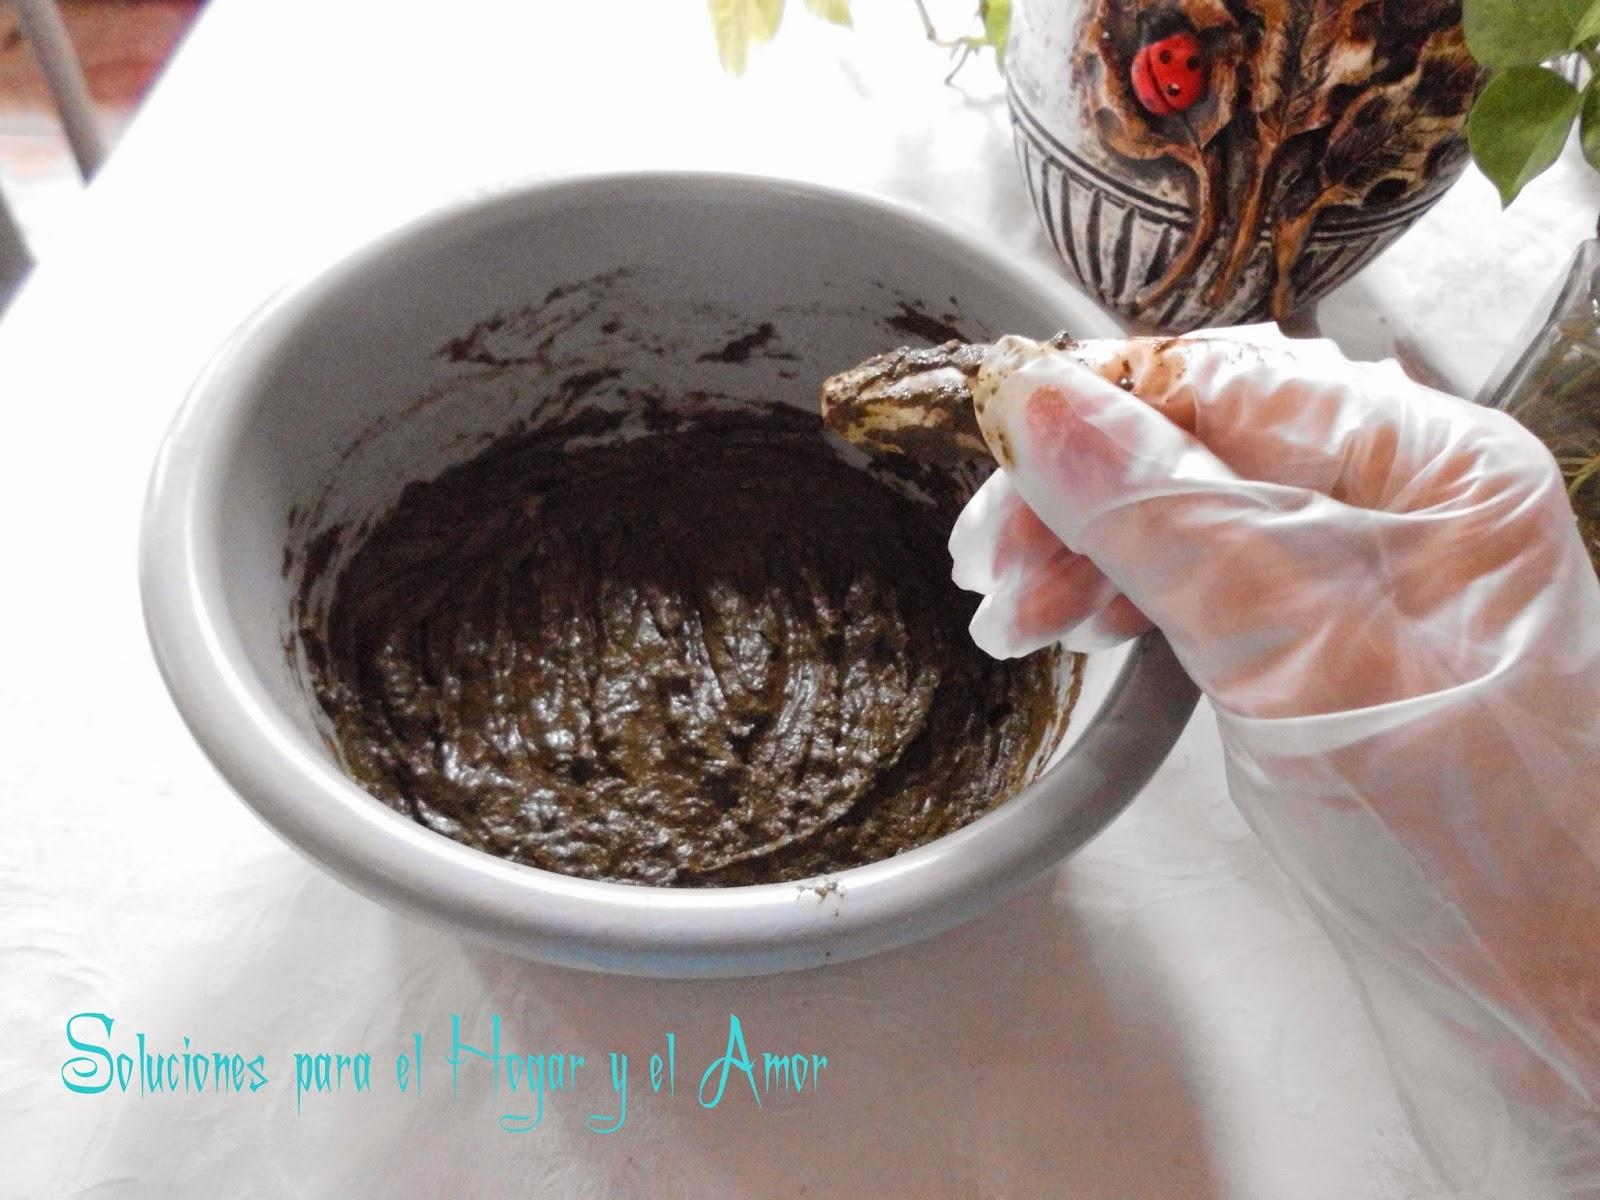 Como teñirse con Henna Tinte Natural para el Cabello Paso a Paso como preparar la Henna para teñirse el cabello